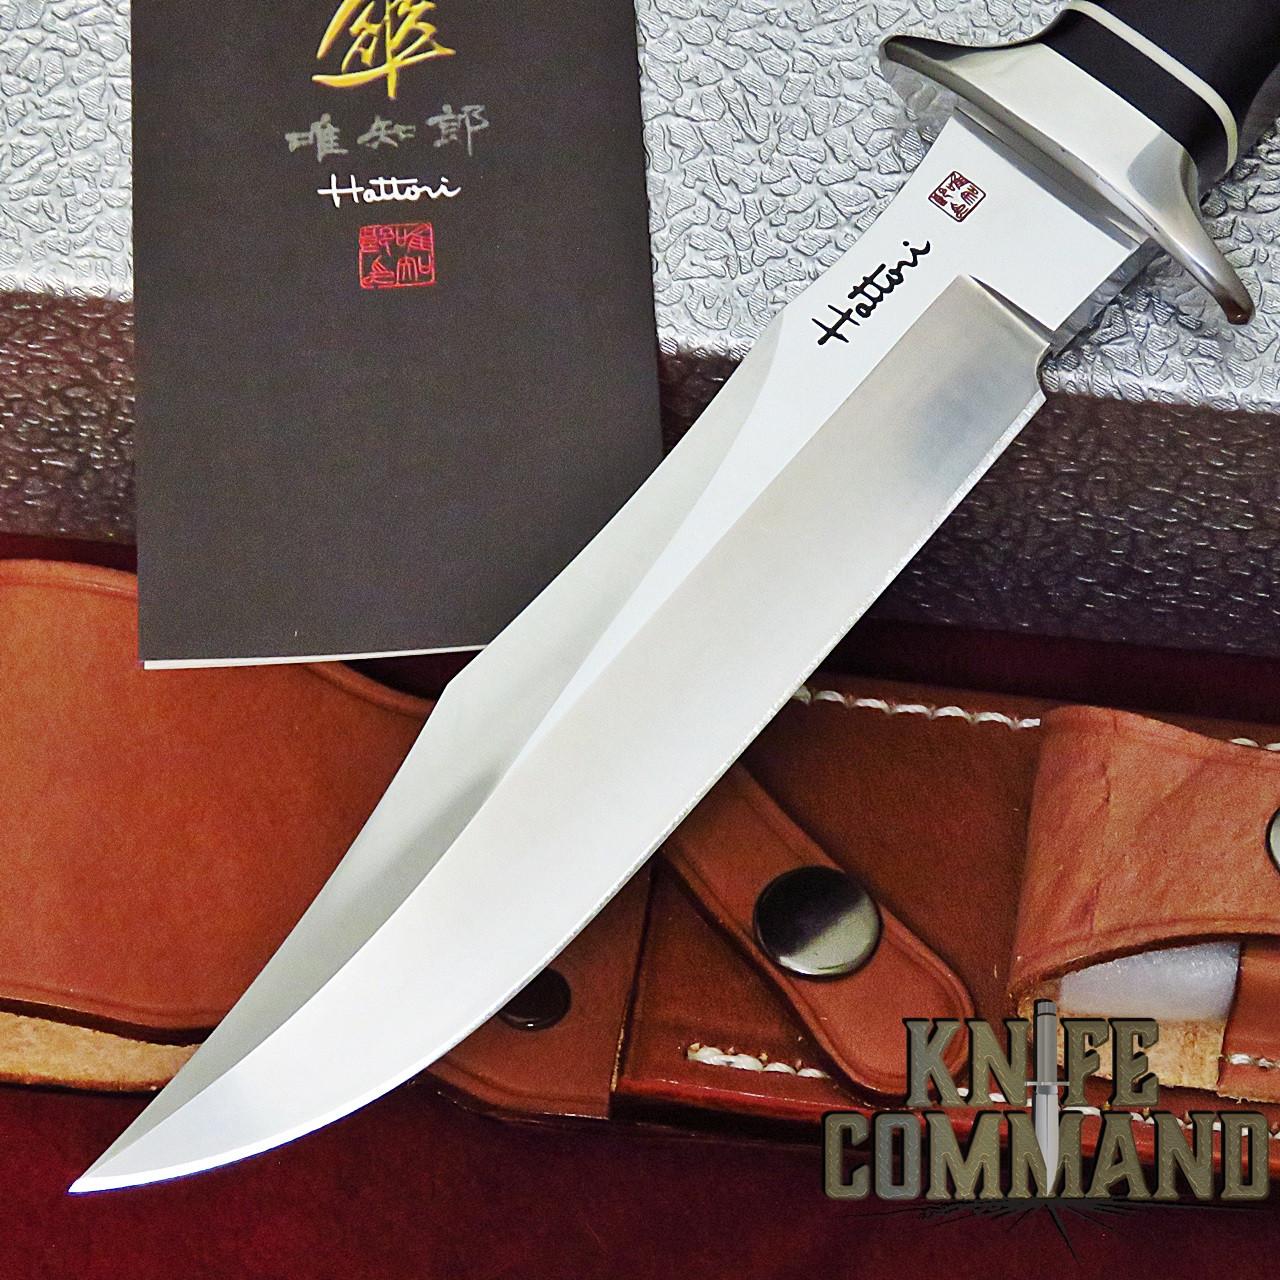 "Hattori Knives TV-3 Black Micarta S.O.G. Style Vietnam Fighter Knife 6-1/4"" Blade"